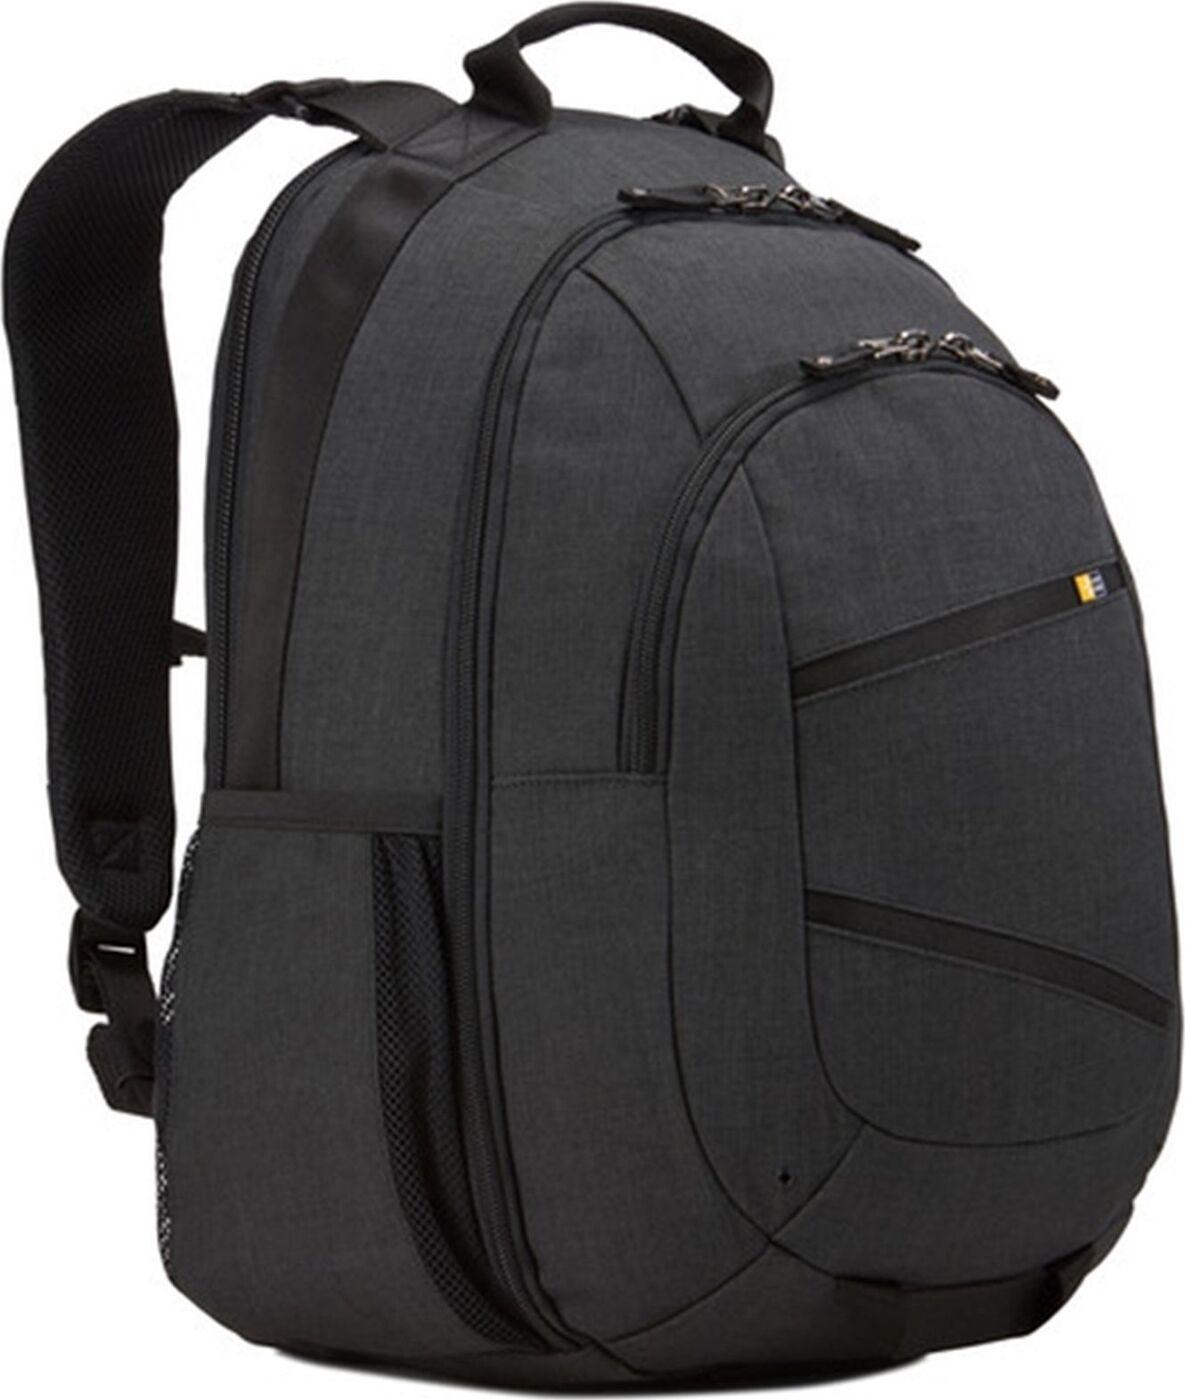 Рюкзак Case Logic Berkeley II для ноутбука 15.6 BPCA-315, Rose, Black рюкзак case logic laptop